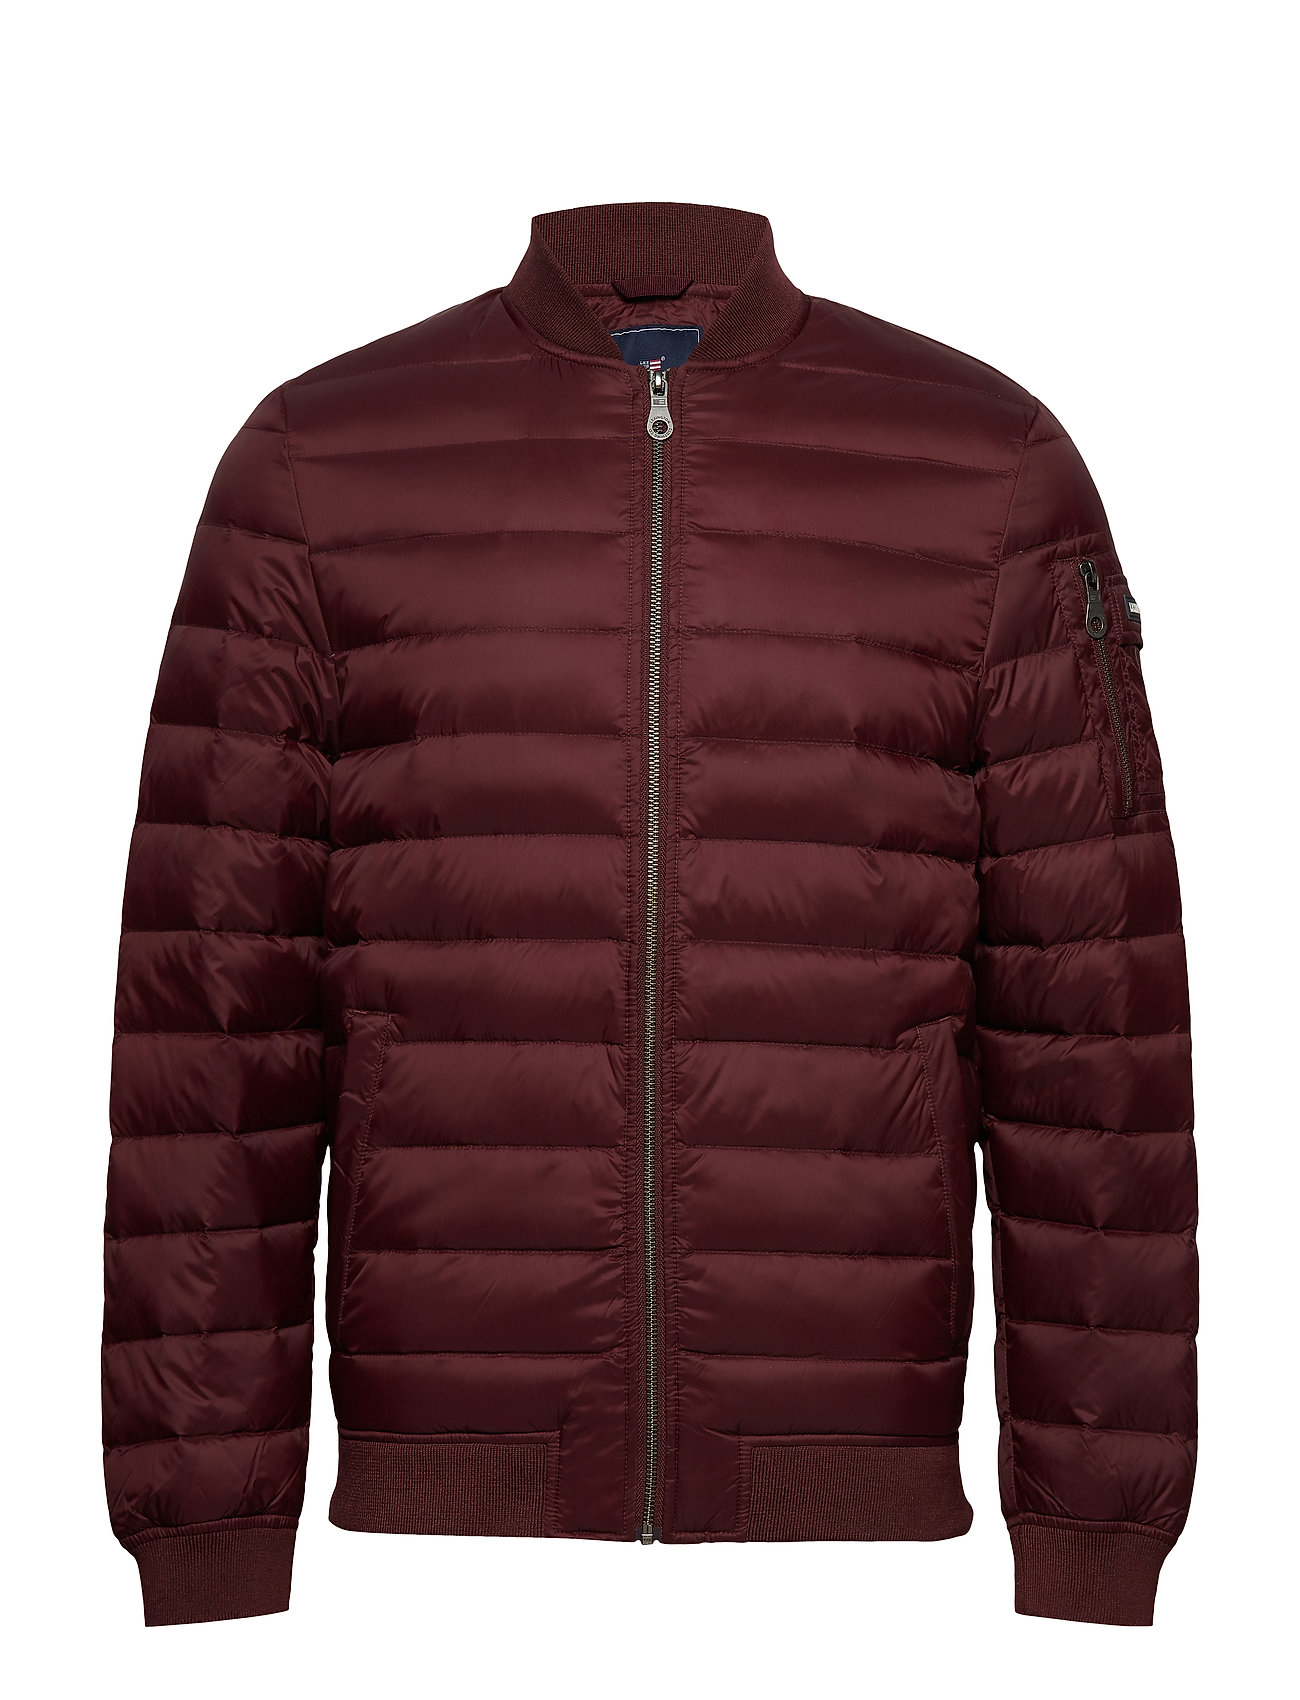 Lexington Clothing Aiden Bomber Down Jacket - BURGUNDY WINE